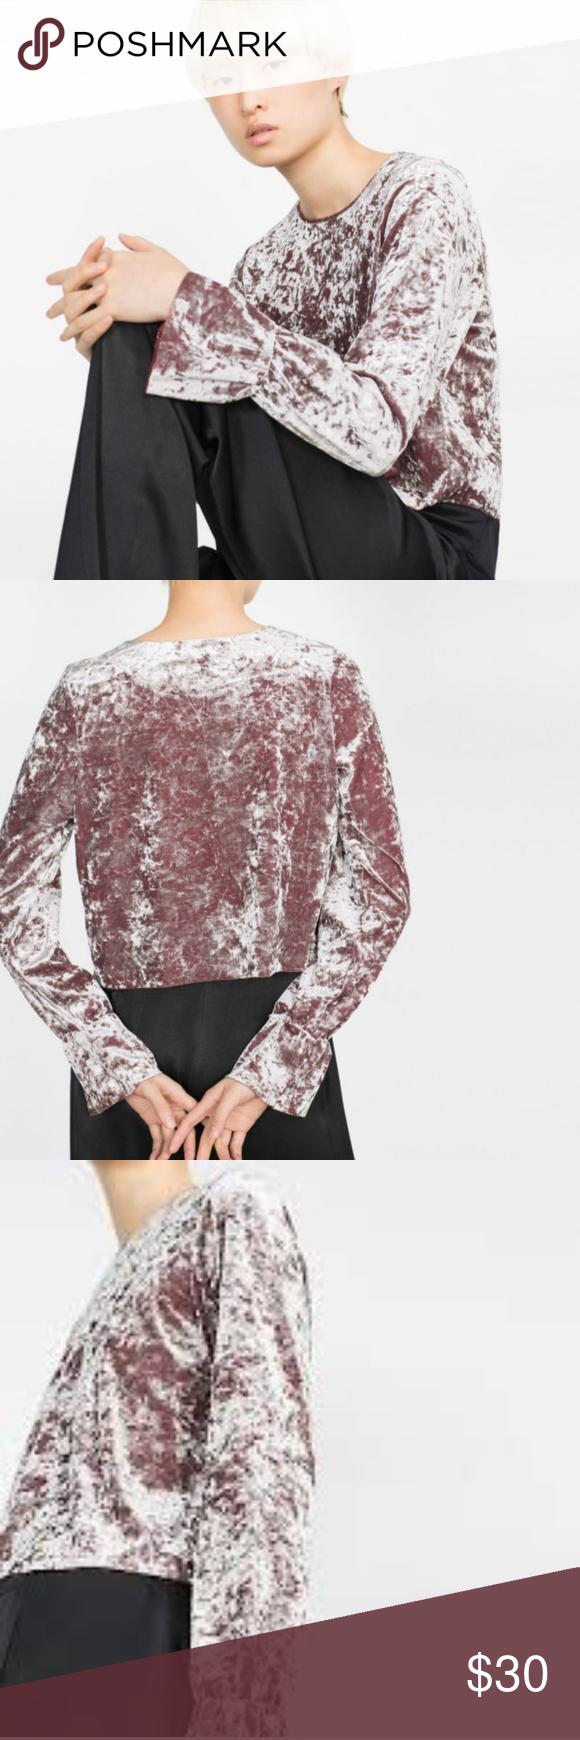 50ab5b156f0 Zara Dusty Pink Velvet Long/Bell Sleeve Crop Top Gorgeous textured ...